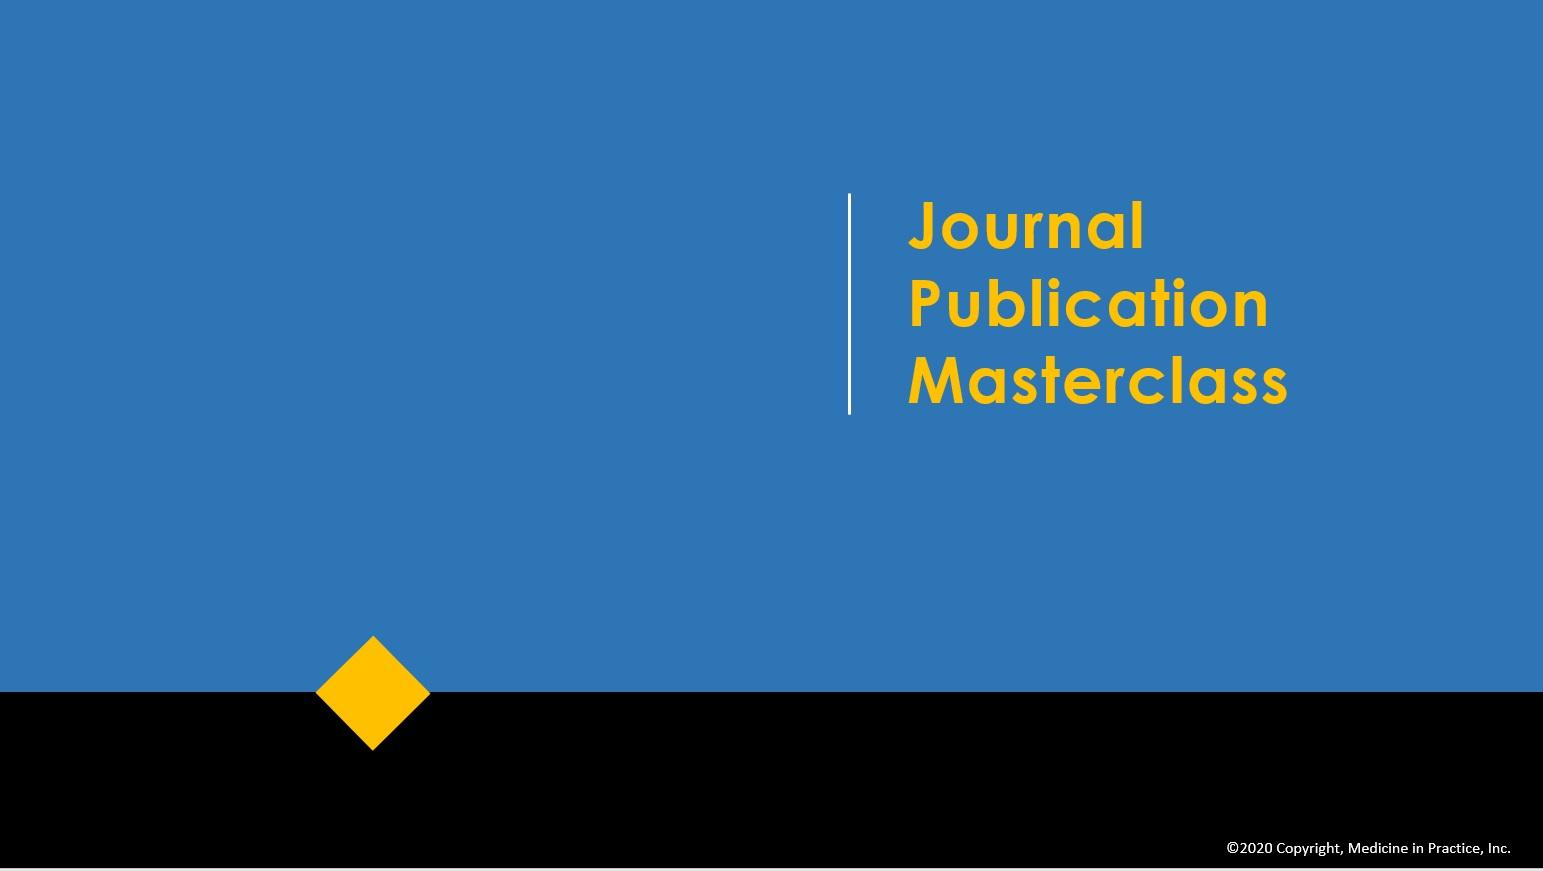 Journal publication masterclass ico